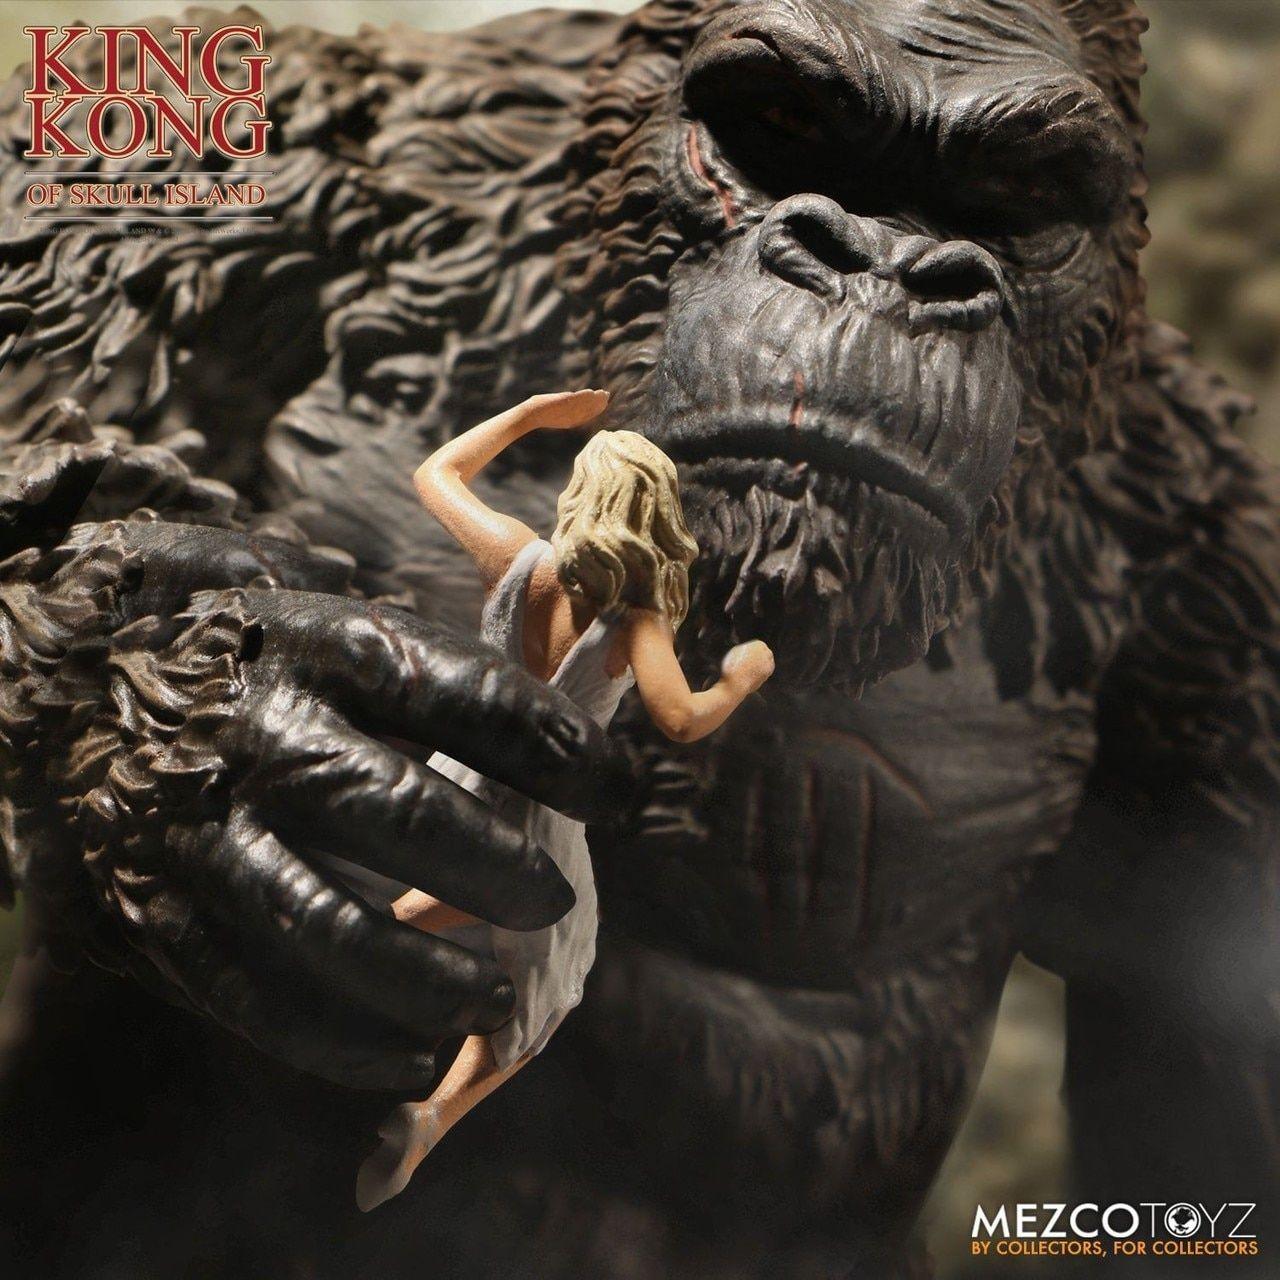 Skull Island King Kong Action Figure Regular Version King Kong Skull Island Movie Monsters